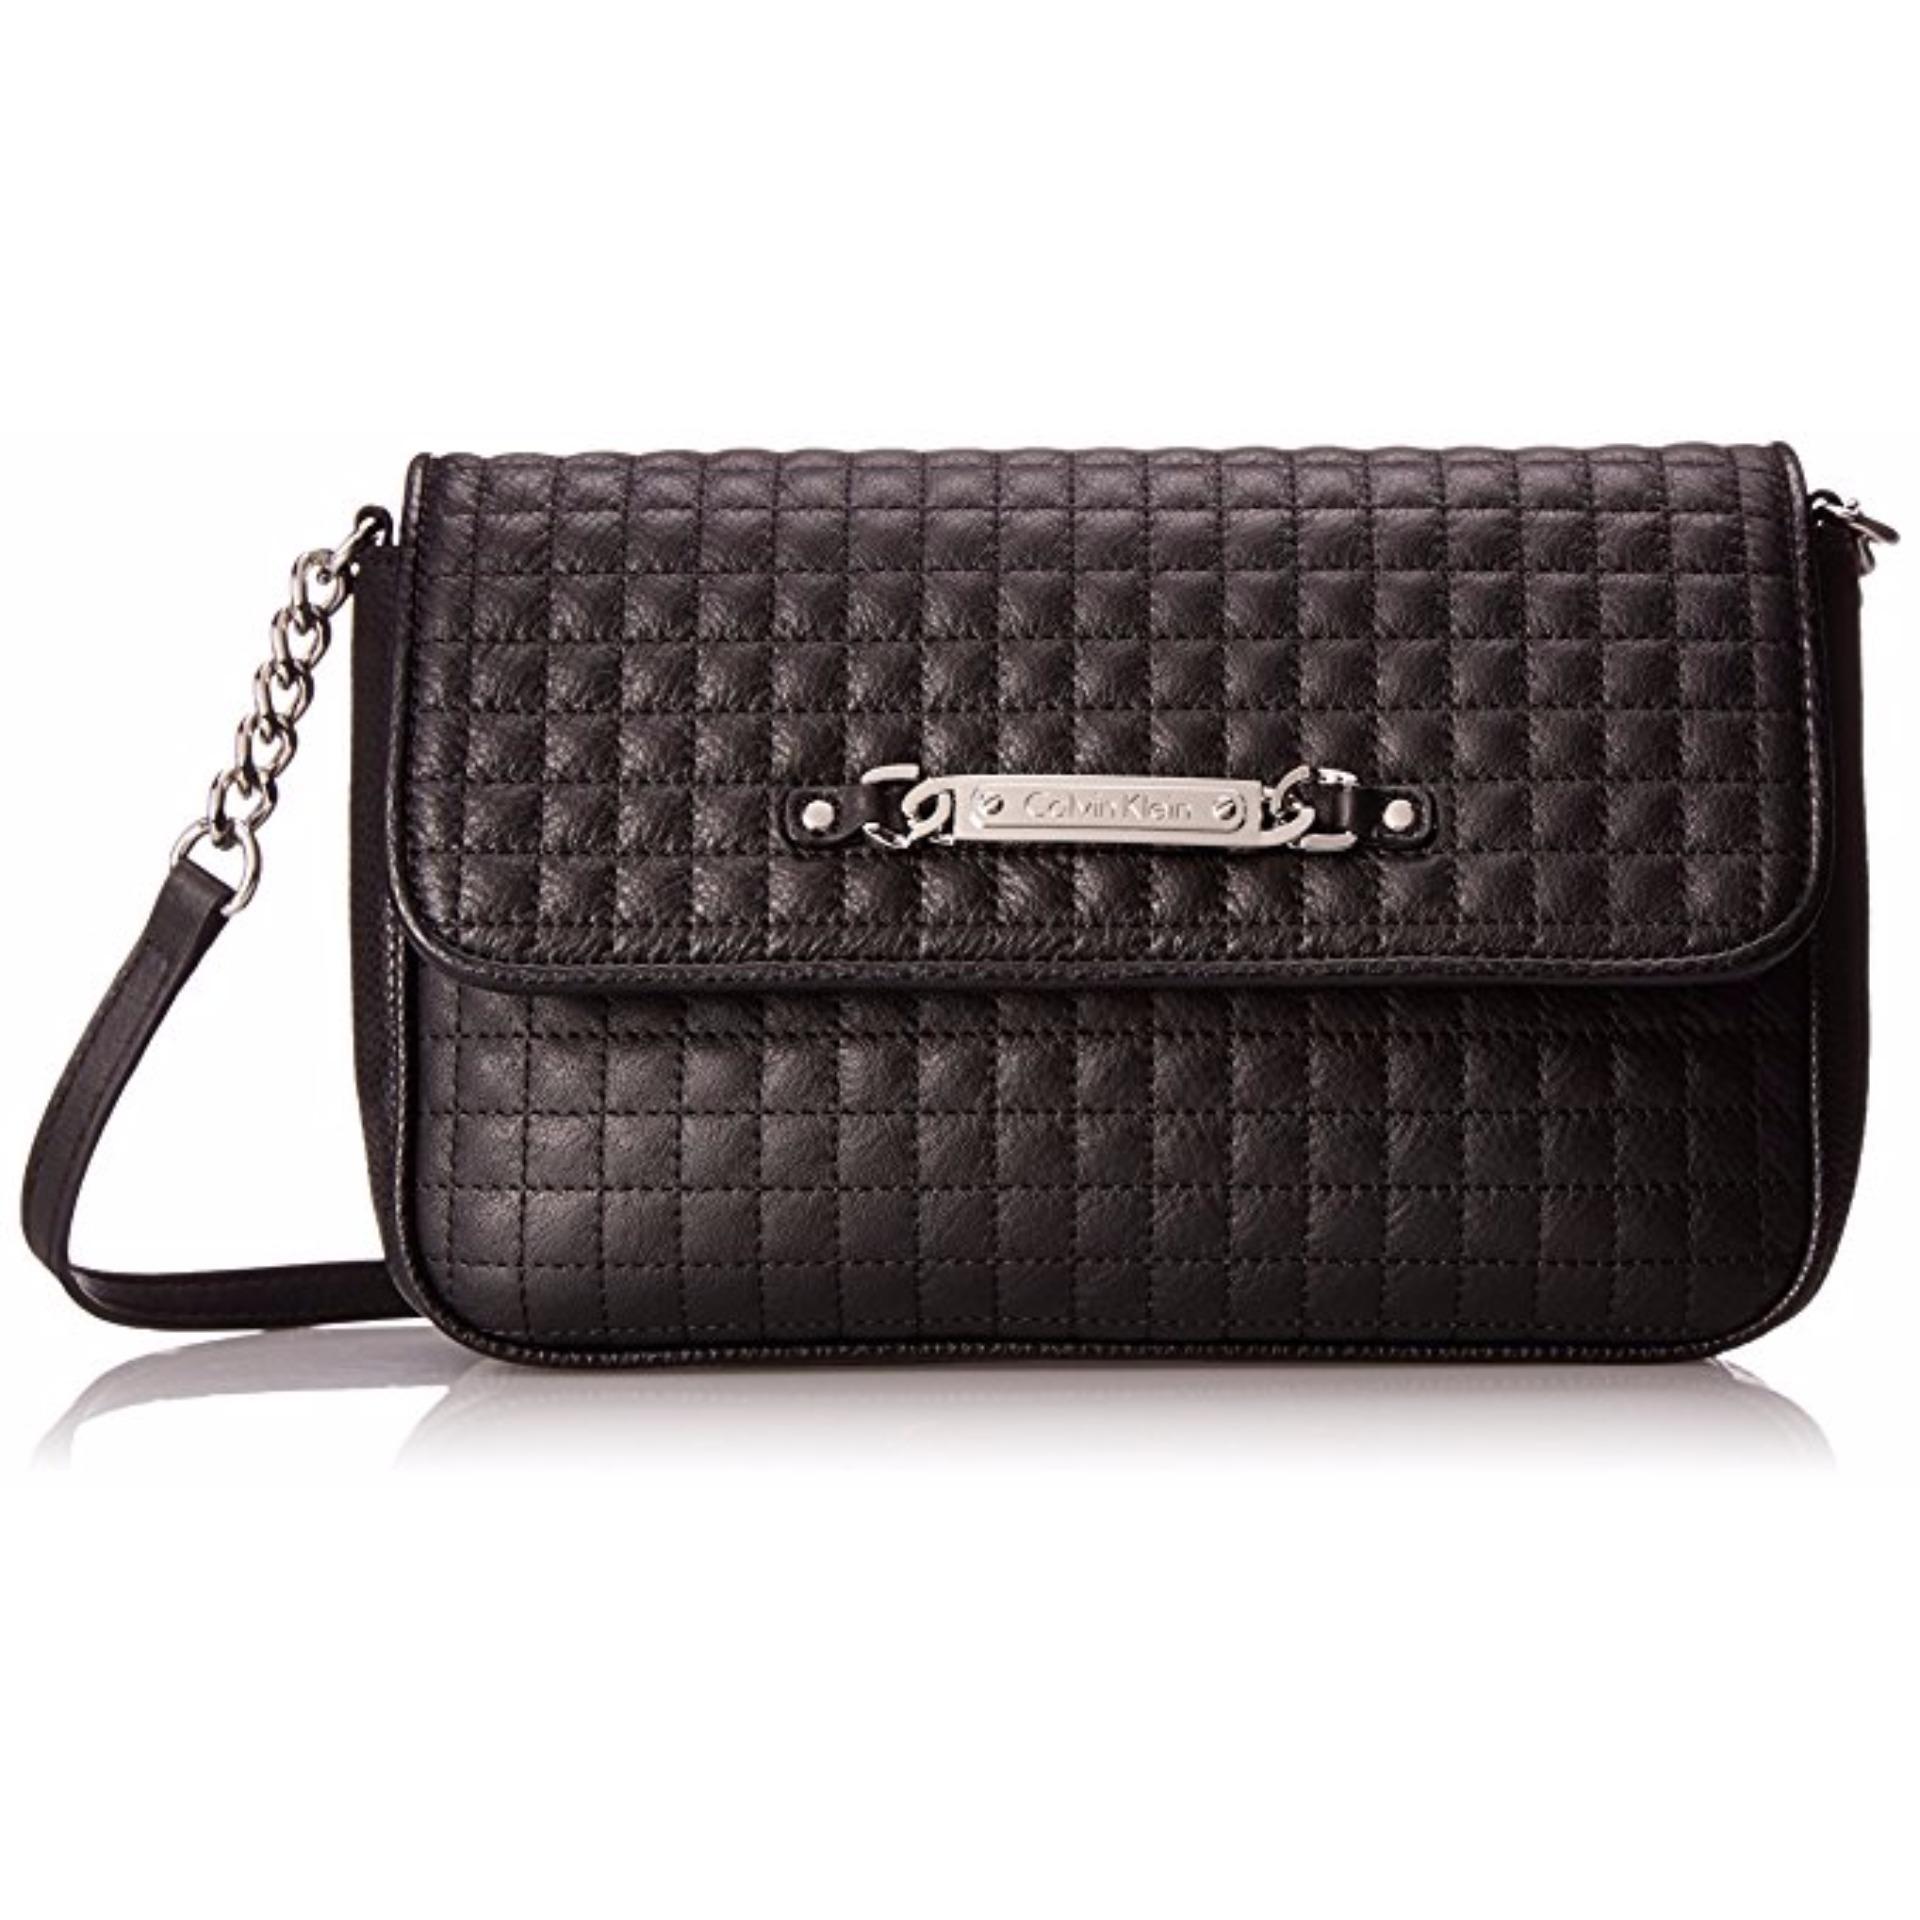 451d15fbcdb Calvin Klein Womens Leather Bag Quilted Pebble Shoulder Black